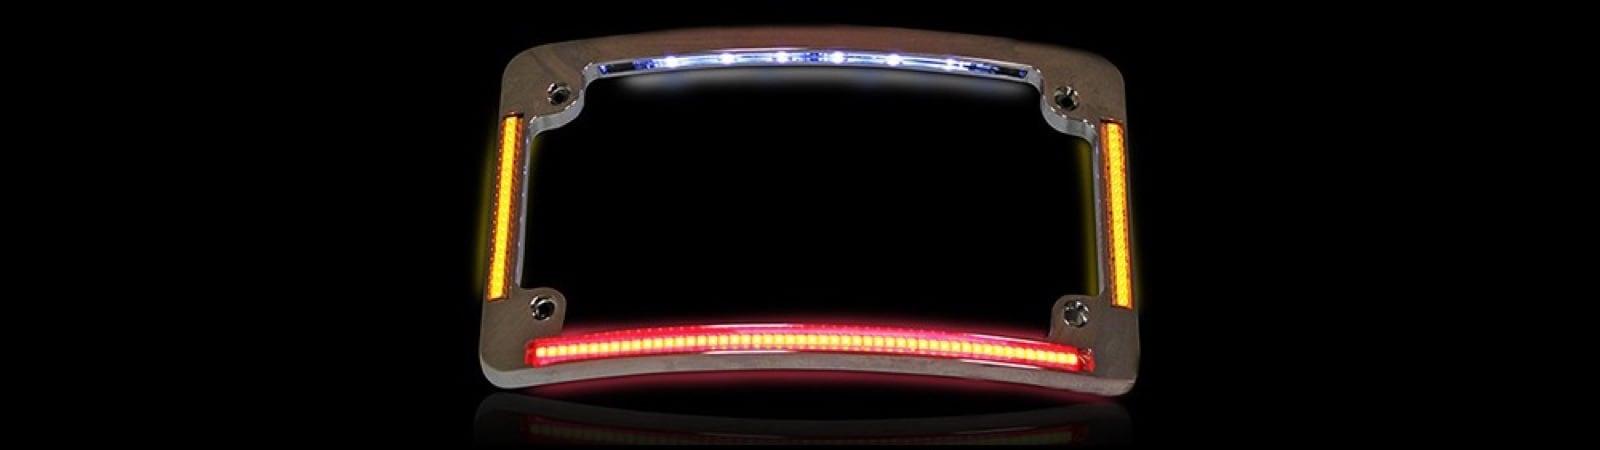 Motorcycle LED License Plate Frames